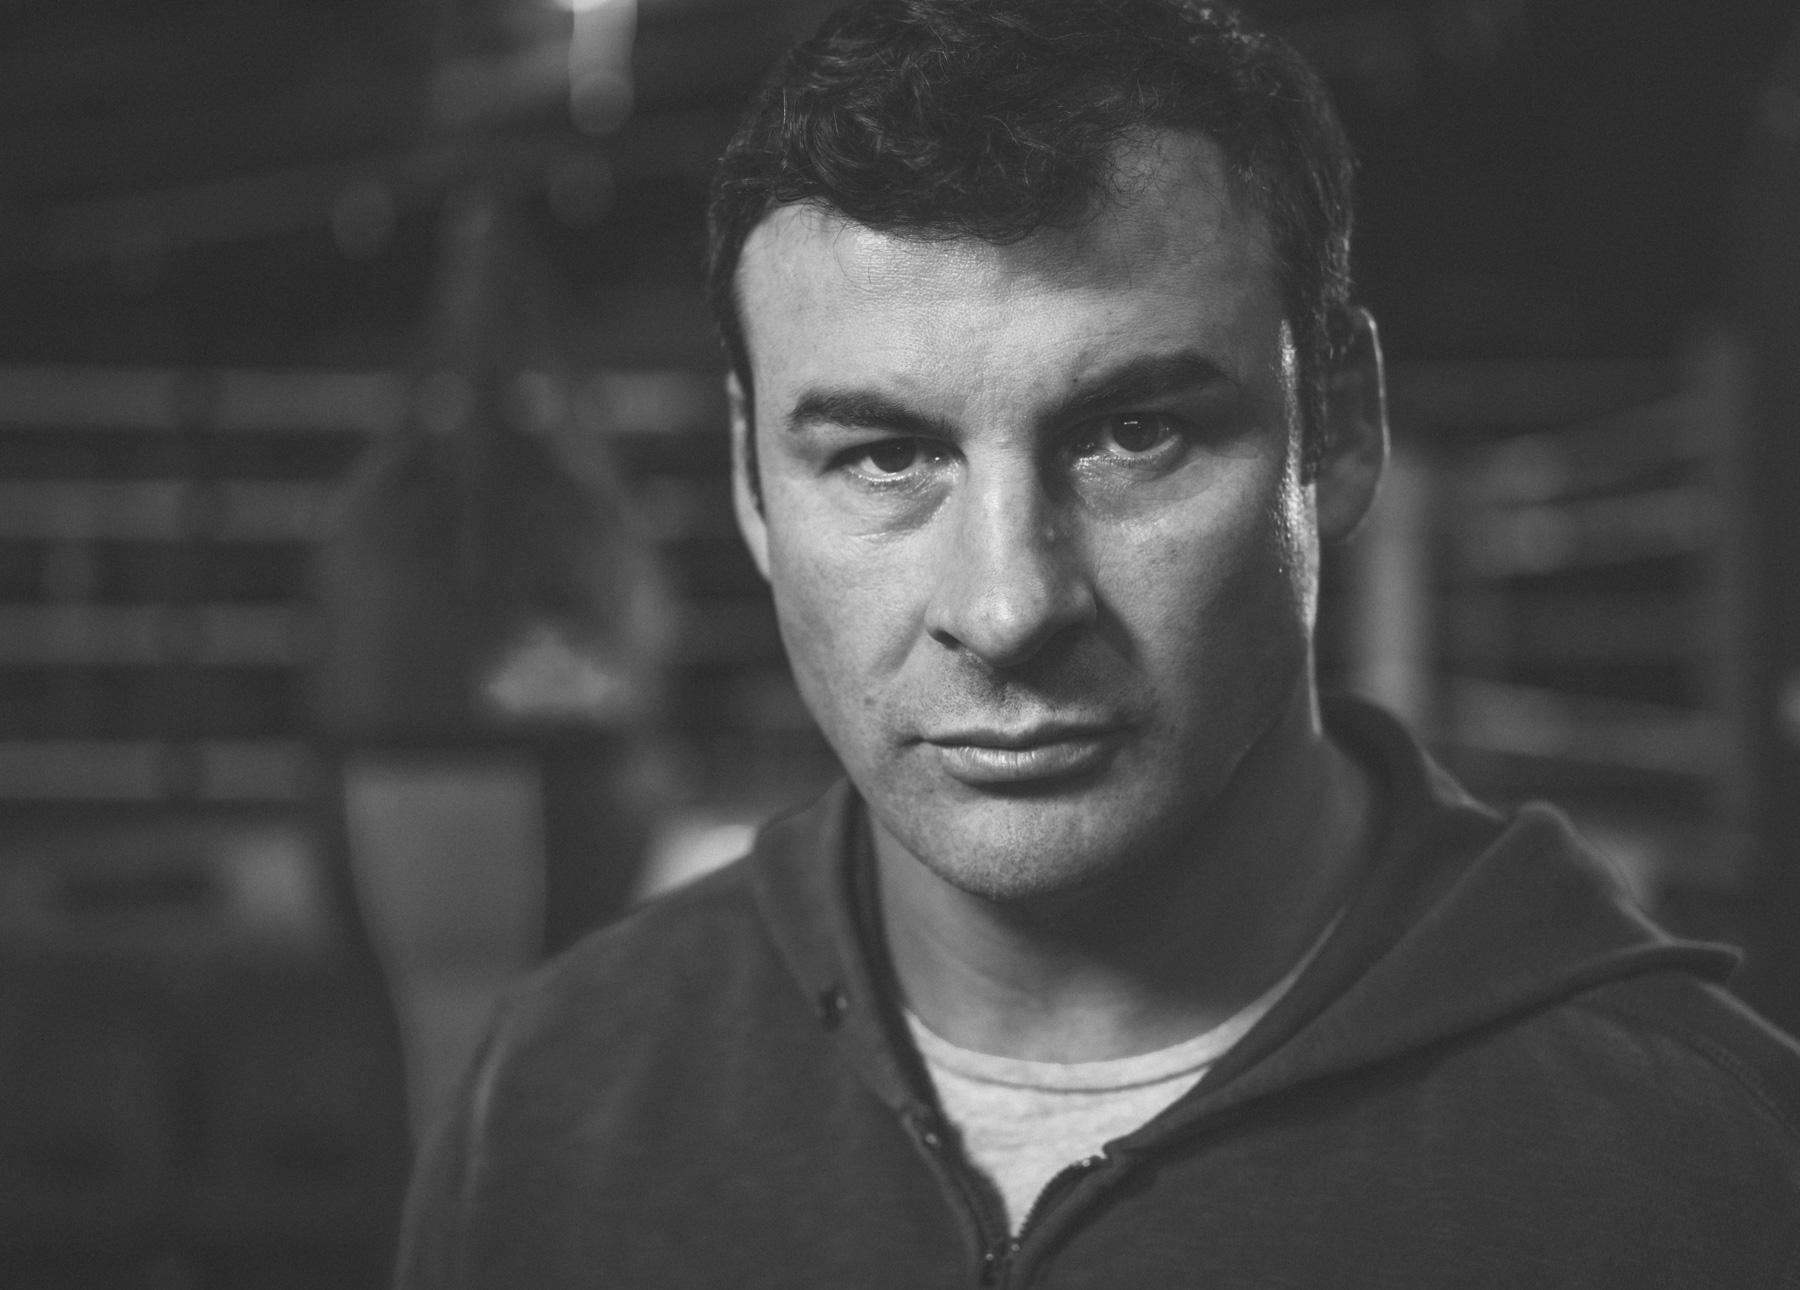 Joe Calzaghe Portrait 2015